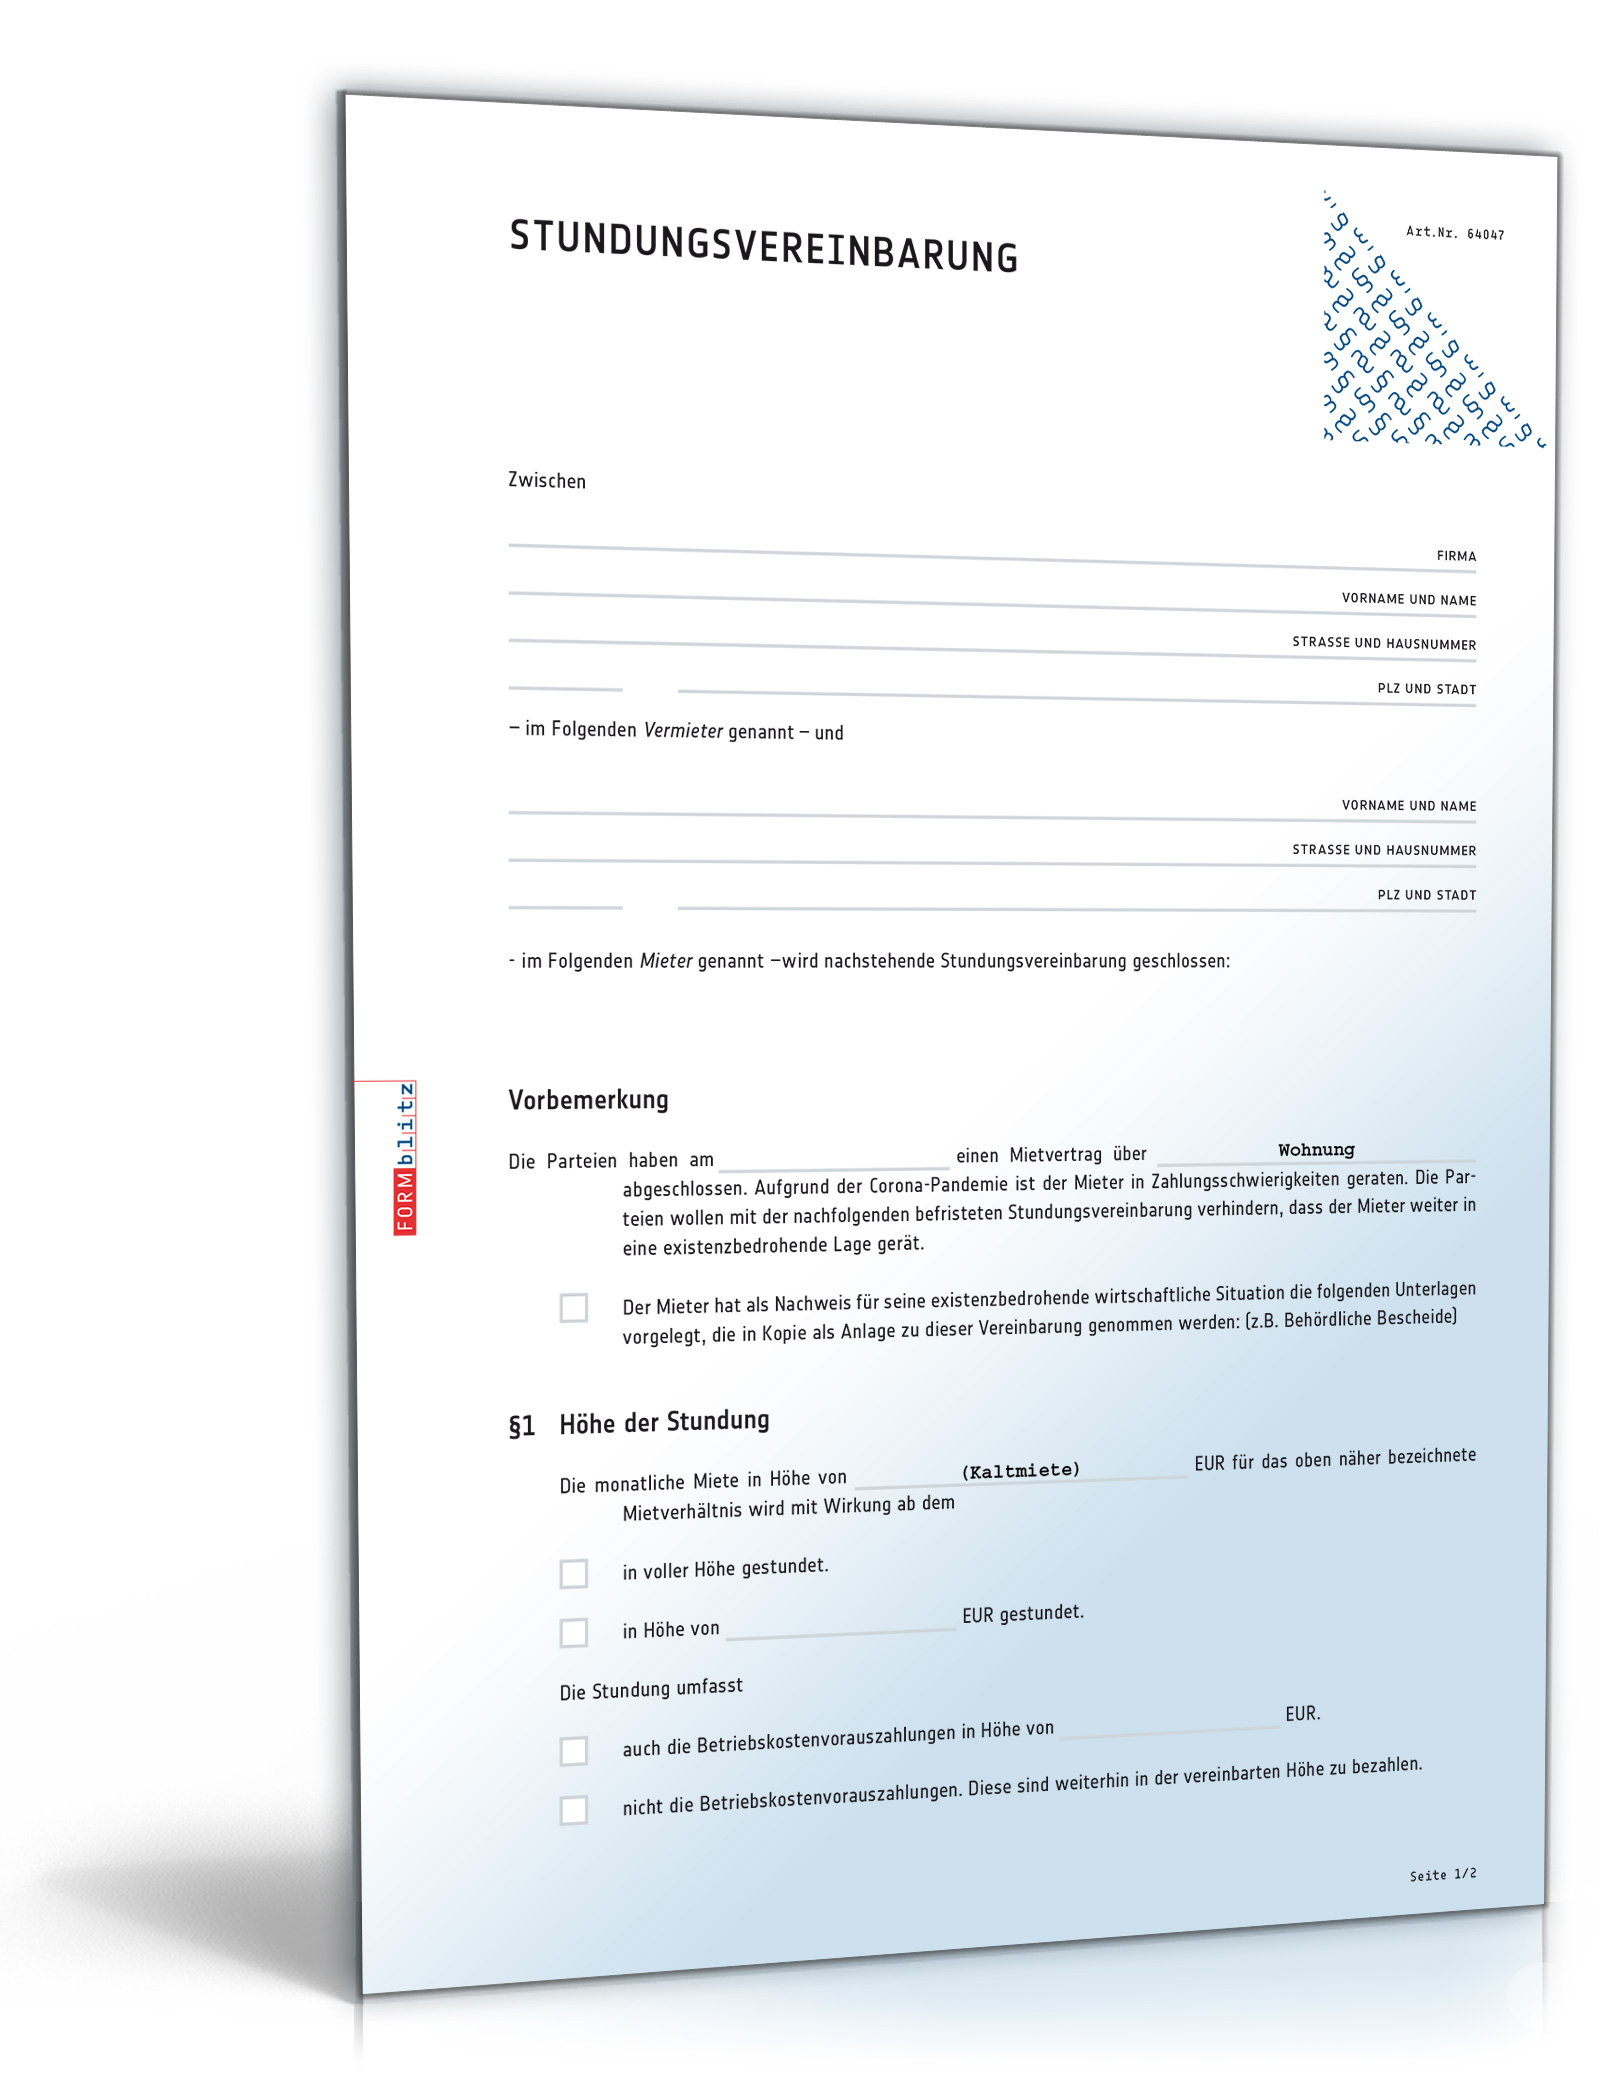 Stundungsvereinbarung Mietvertrag Dokument zum Download